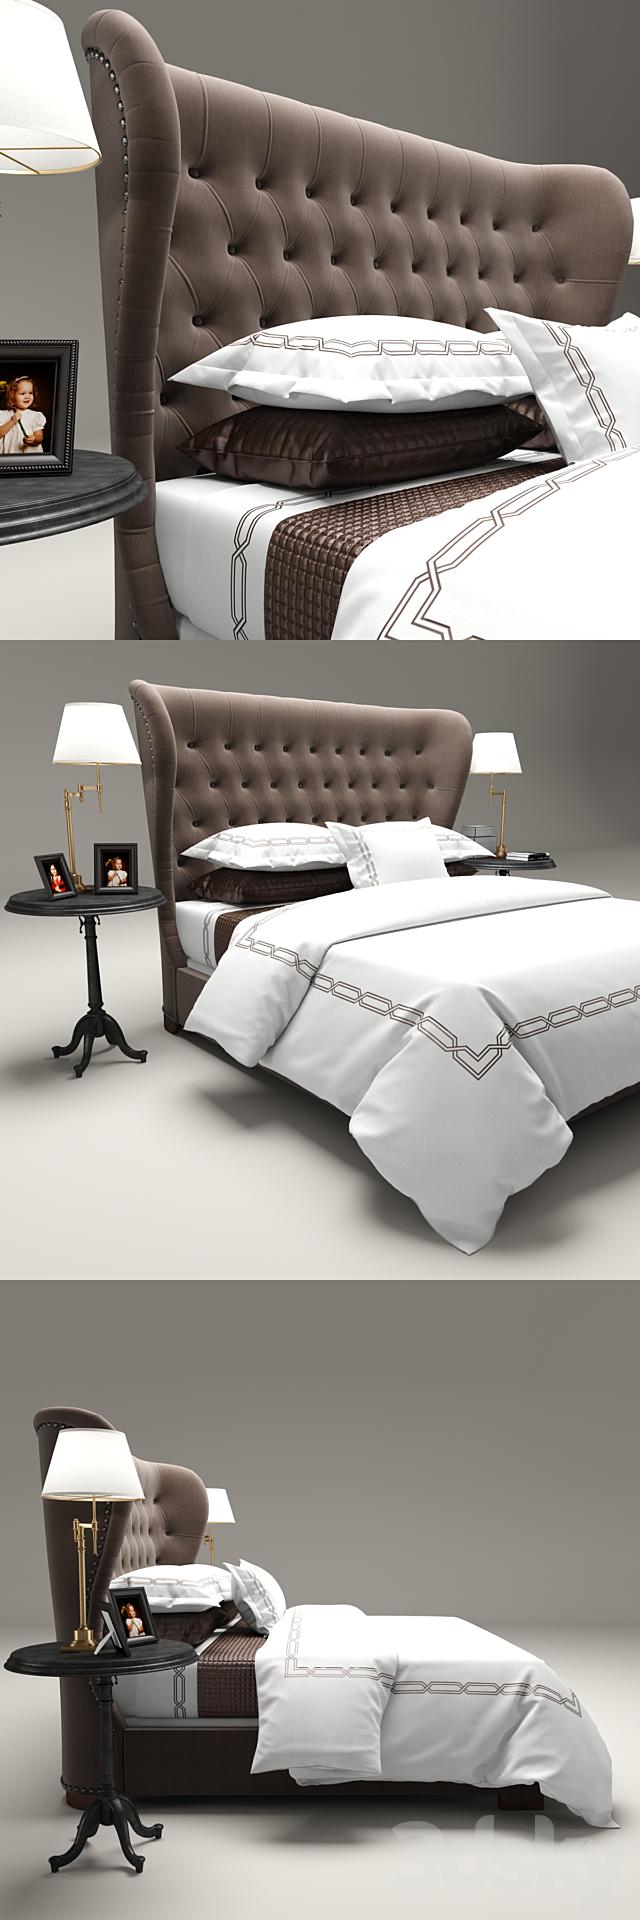 Restoration Hardware Churchill Fabric bed